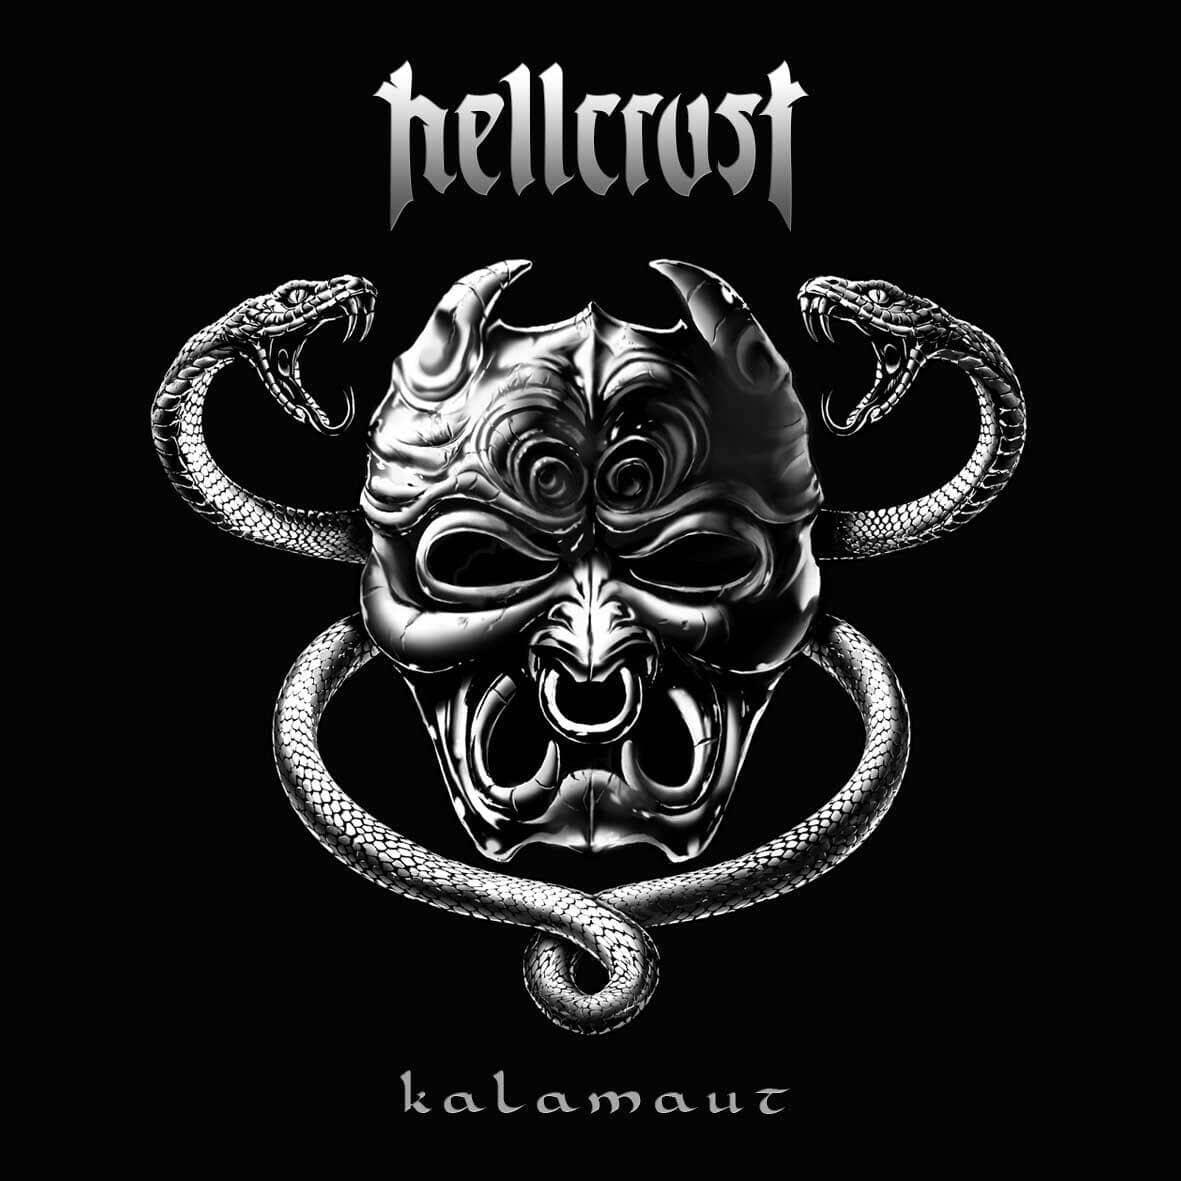 Hellcrust - Kalamaut